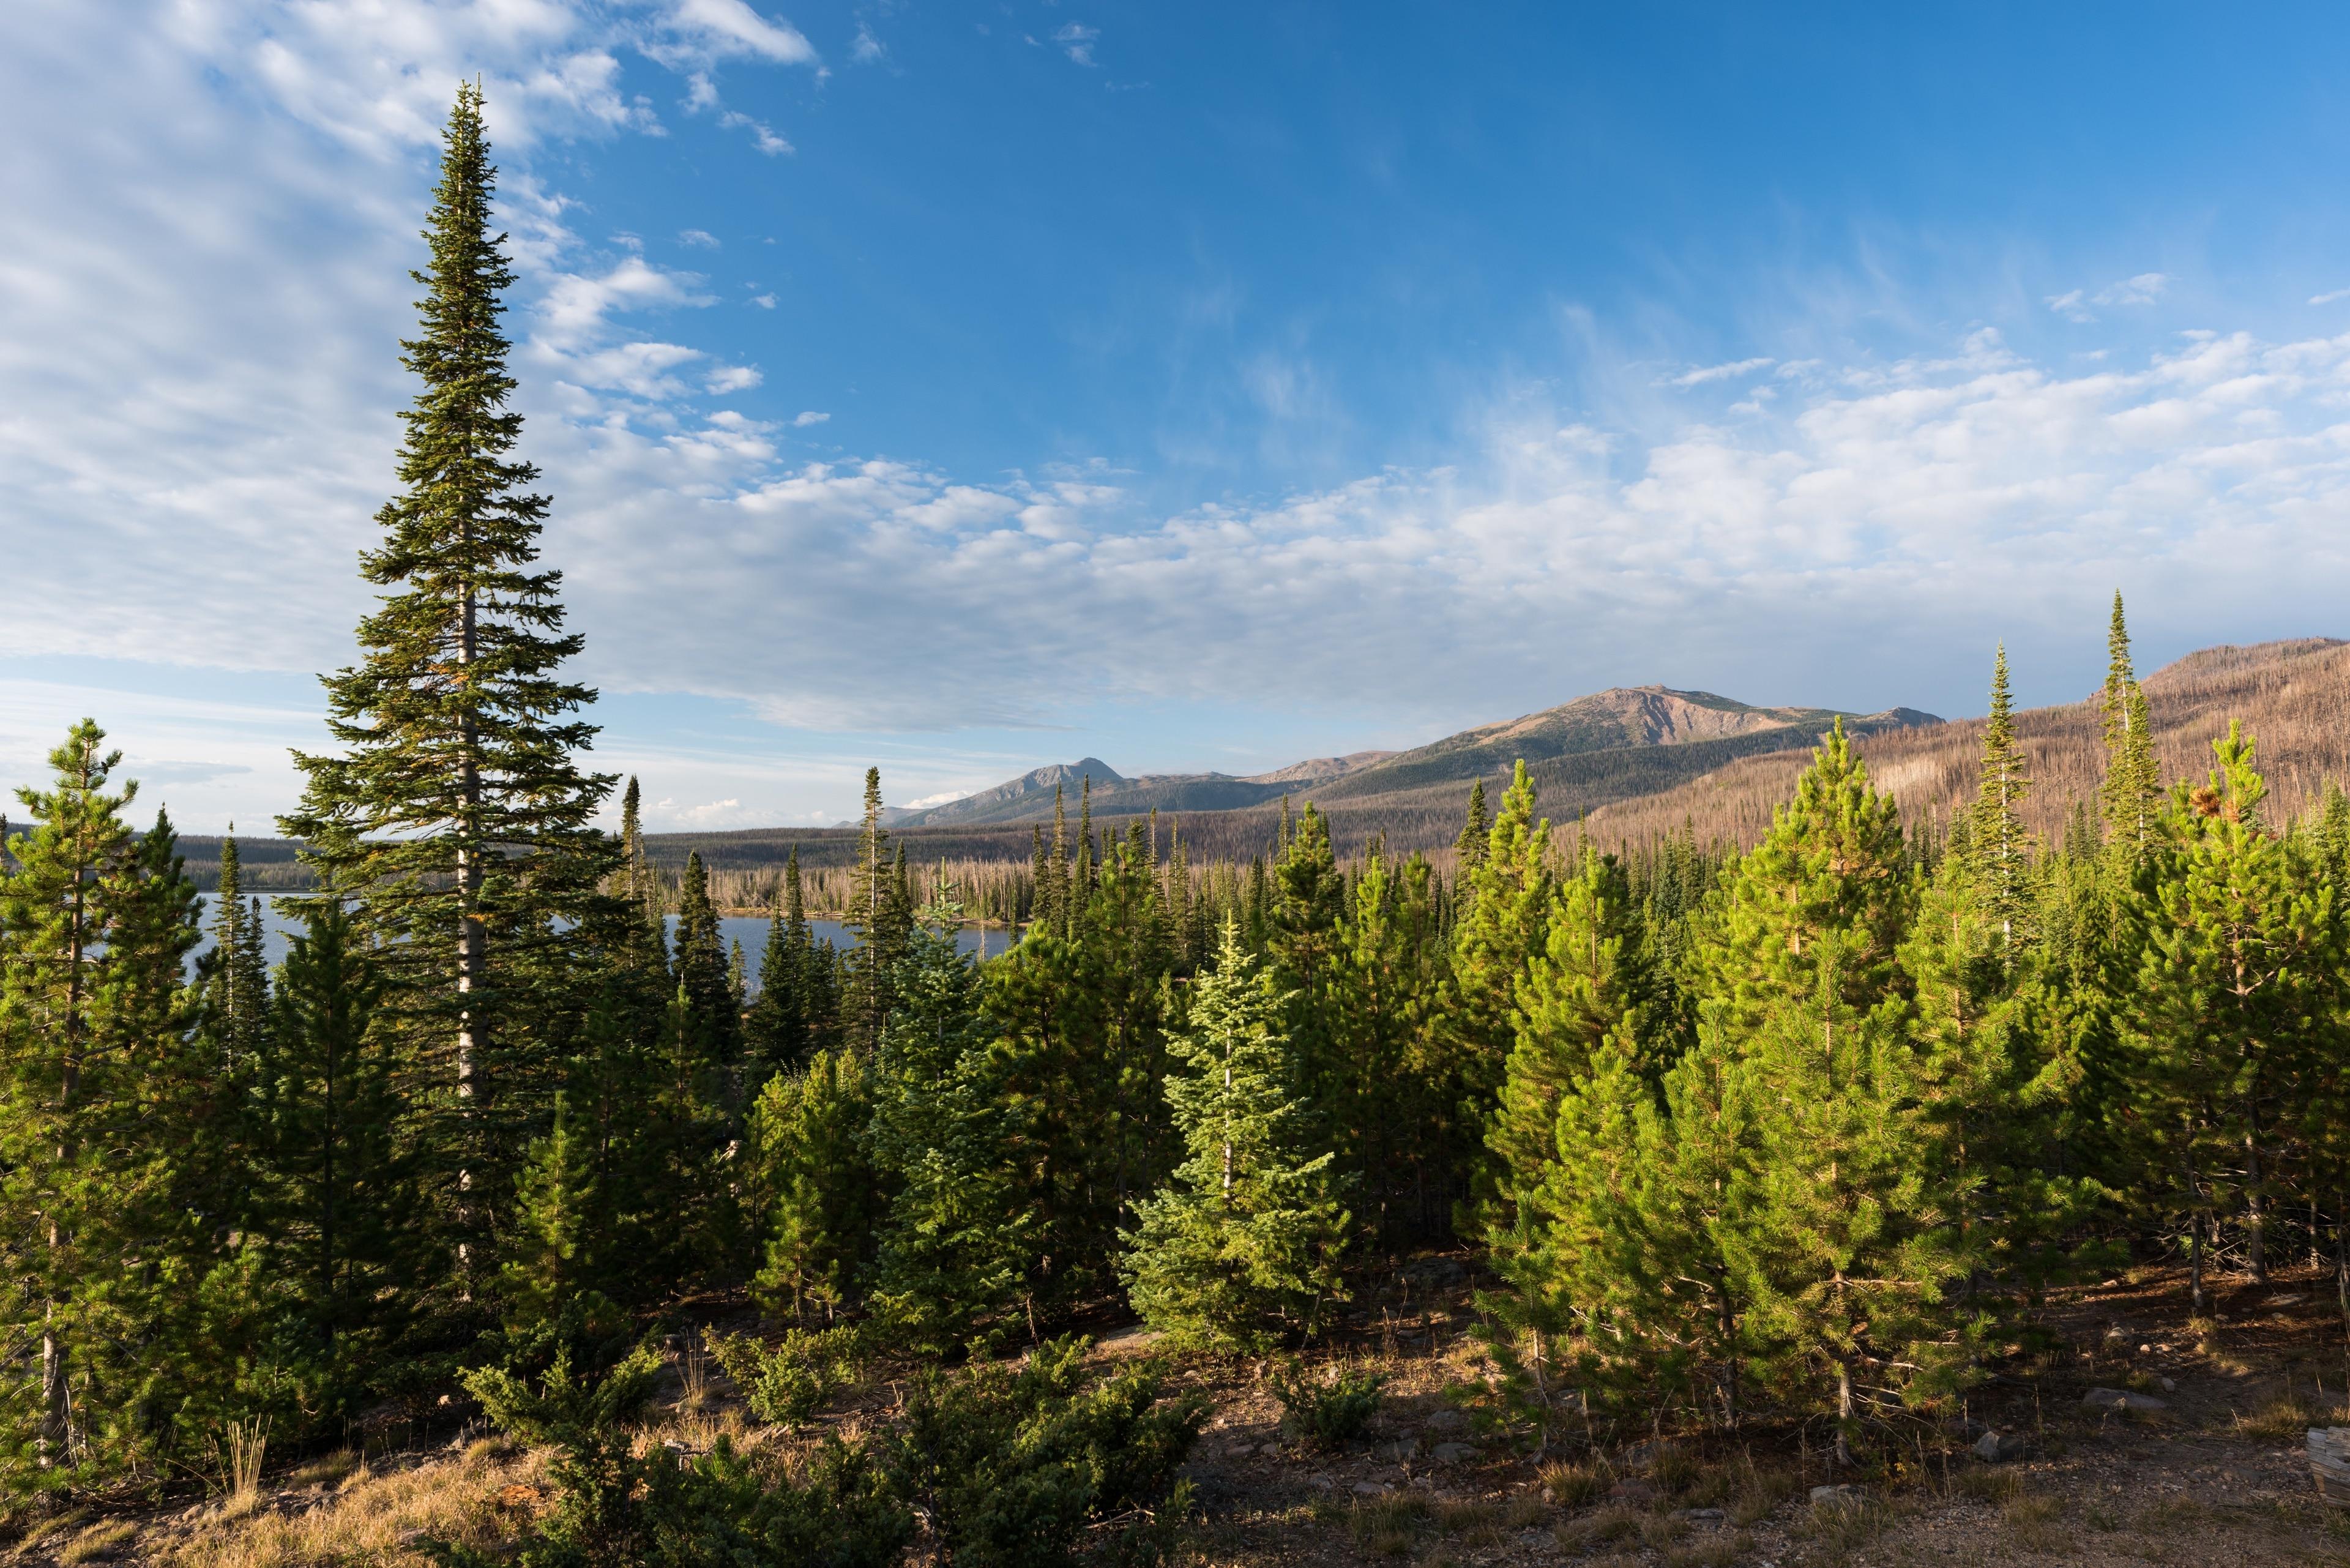 Jackson County, Colorado, United States of America